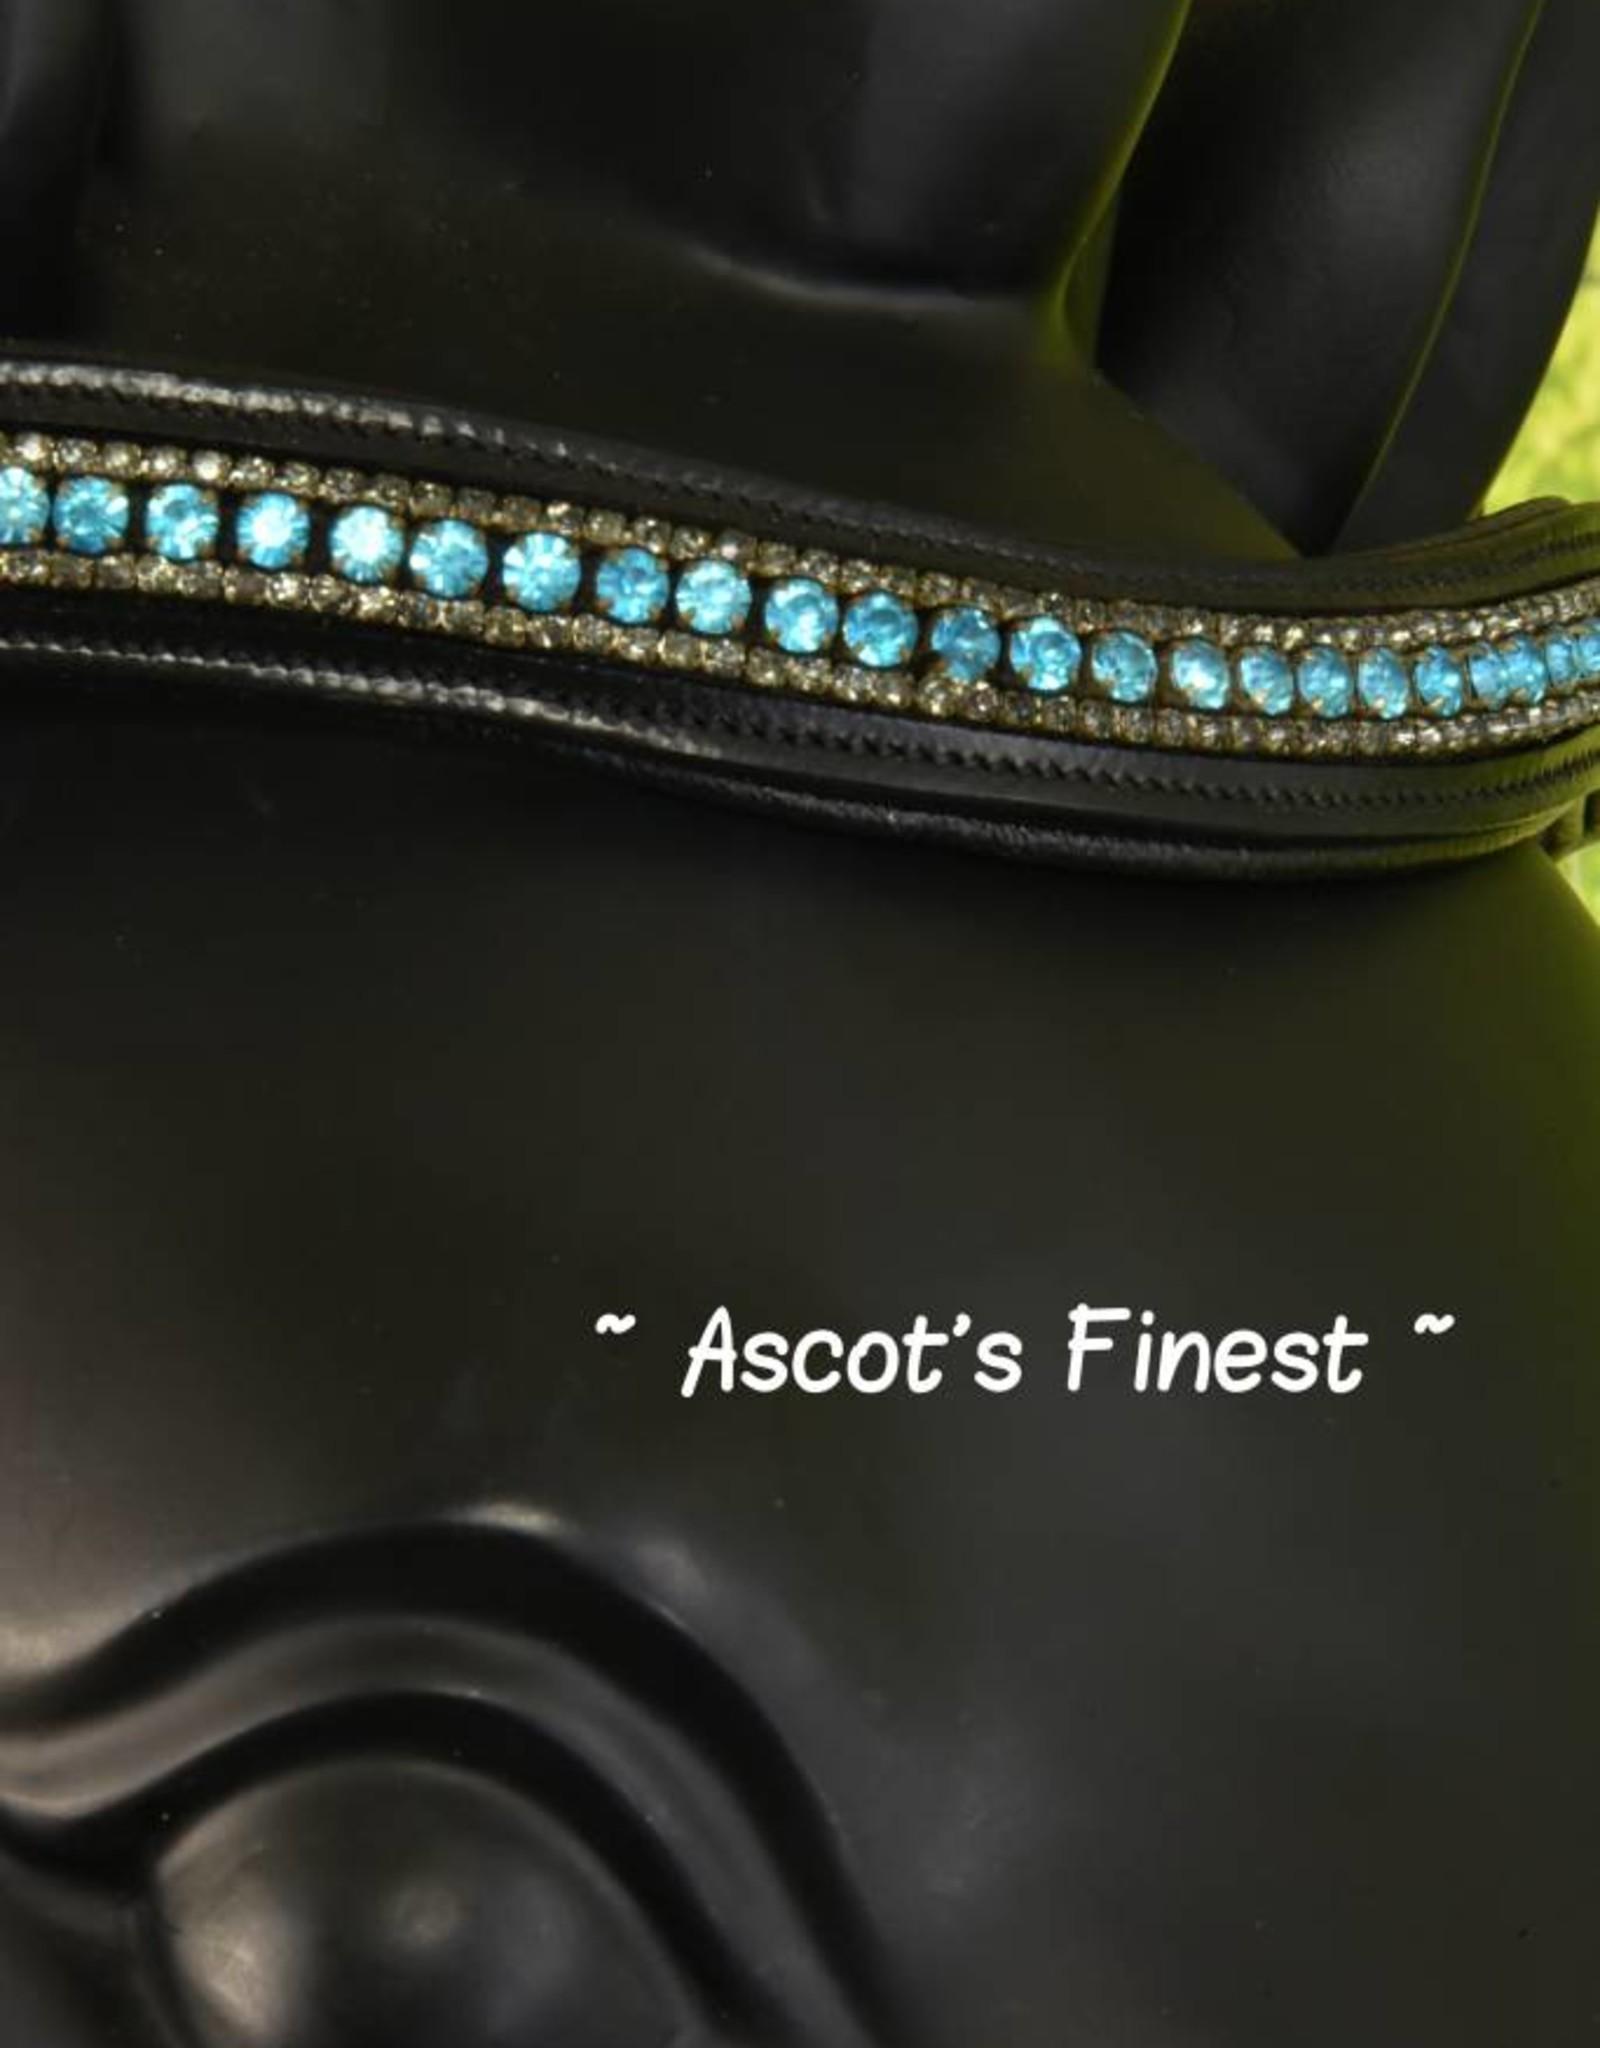 Ascot's Finest Zwart rundleer - turquoise frontriem - Full